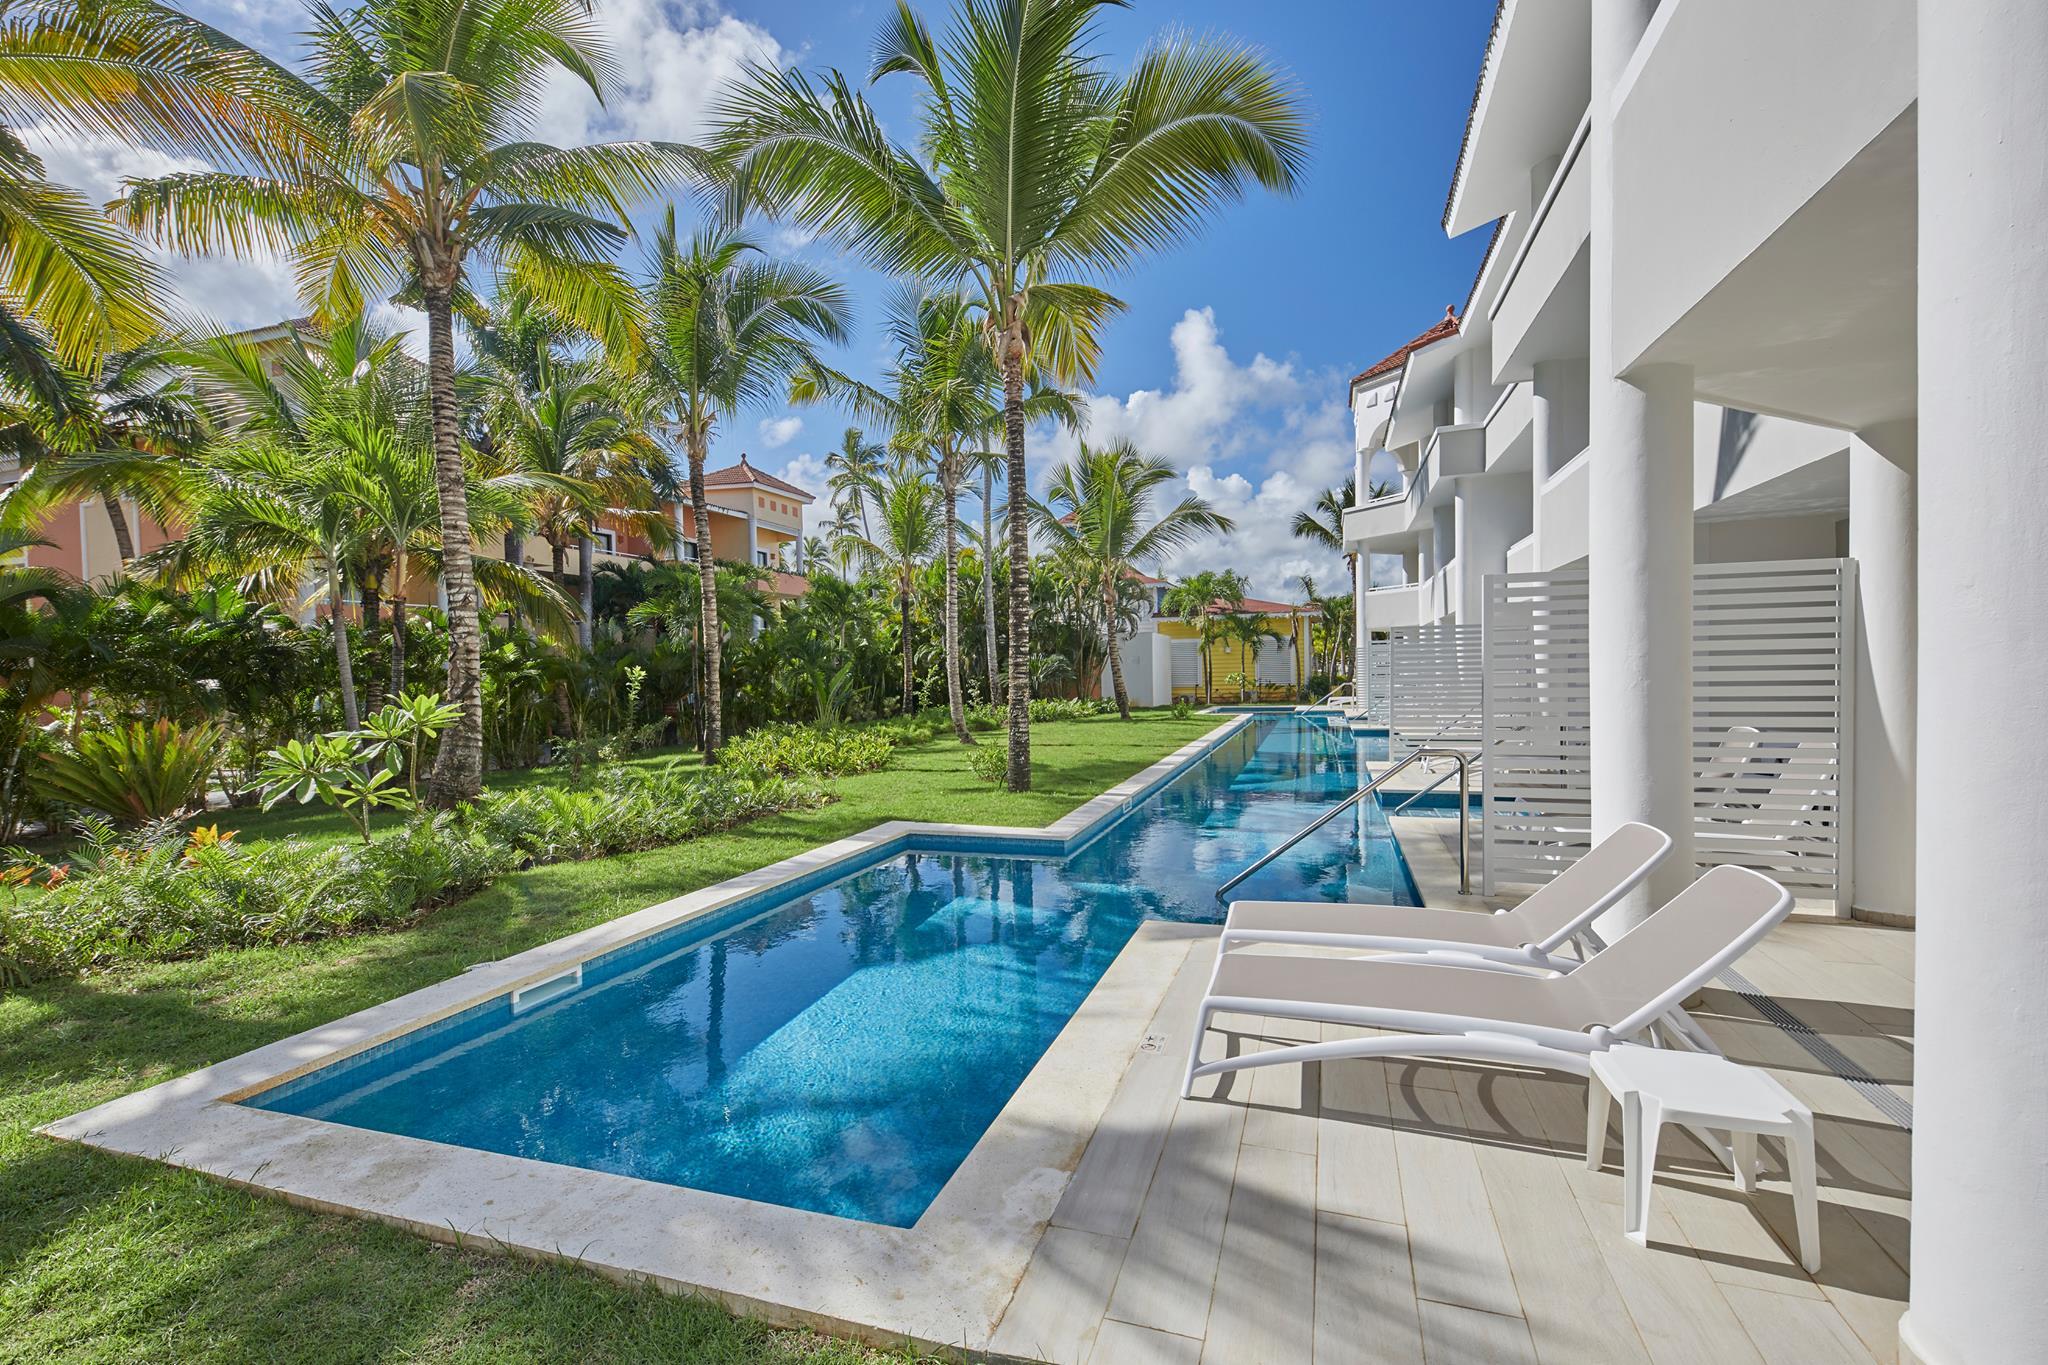 Bahia Principe Luxury Ambar - photo de couverture